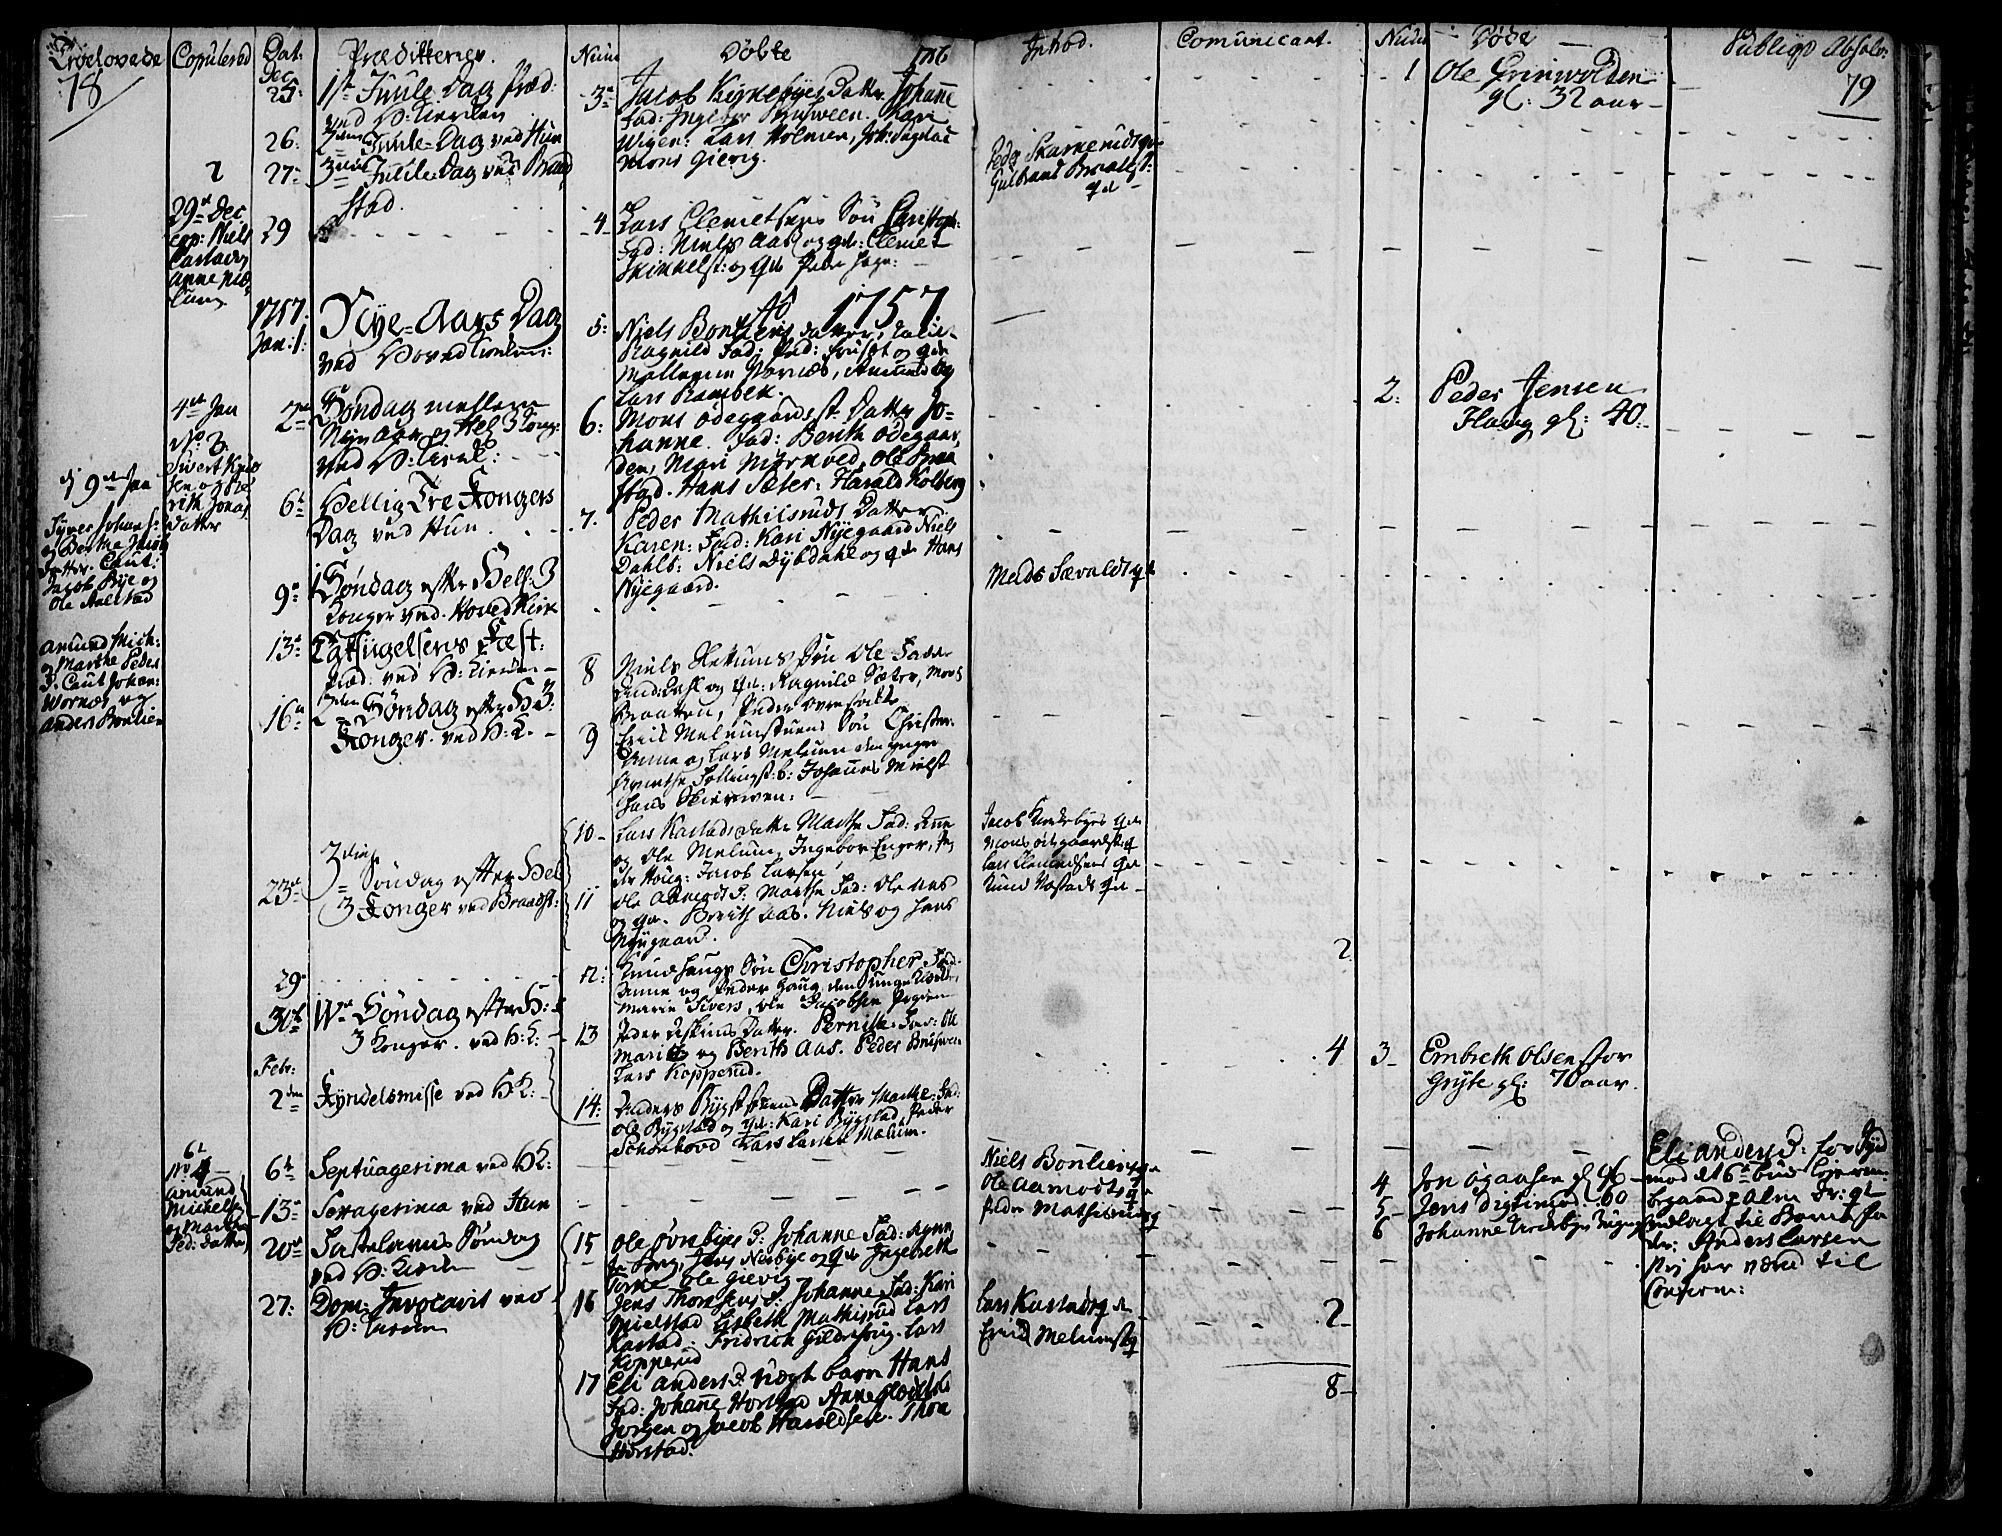 SAH, Vardal prestekontor, H/Ha/Haa/L0002: Ministerialbok nr. 2, 1748-1776, s. 78-79